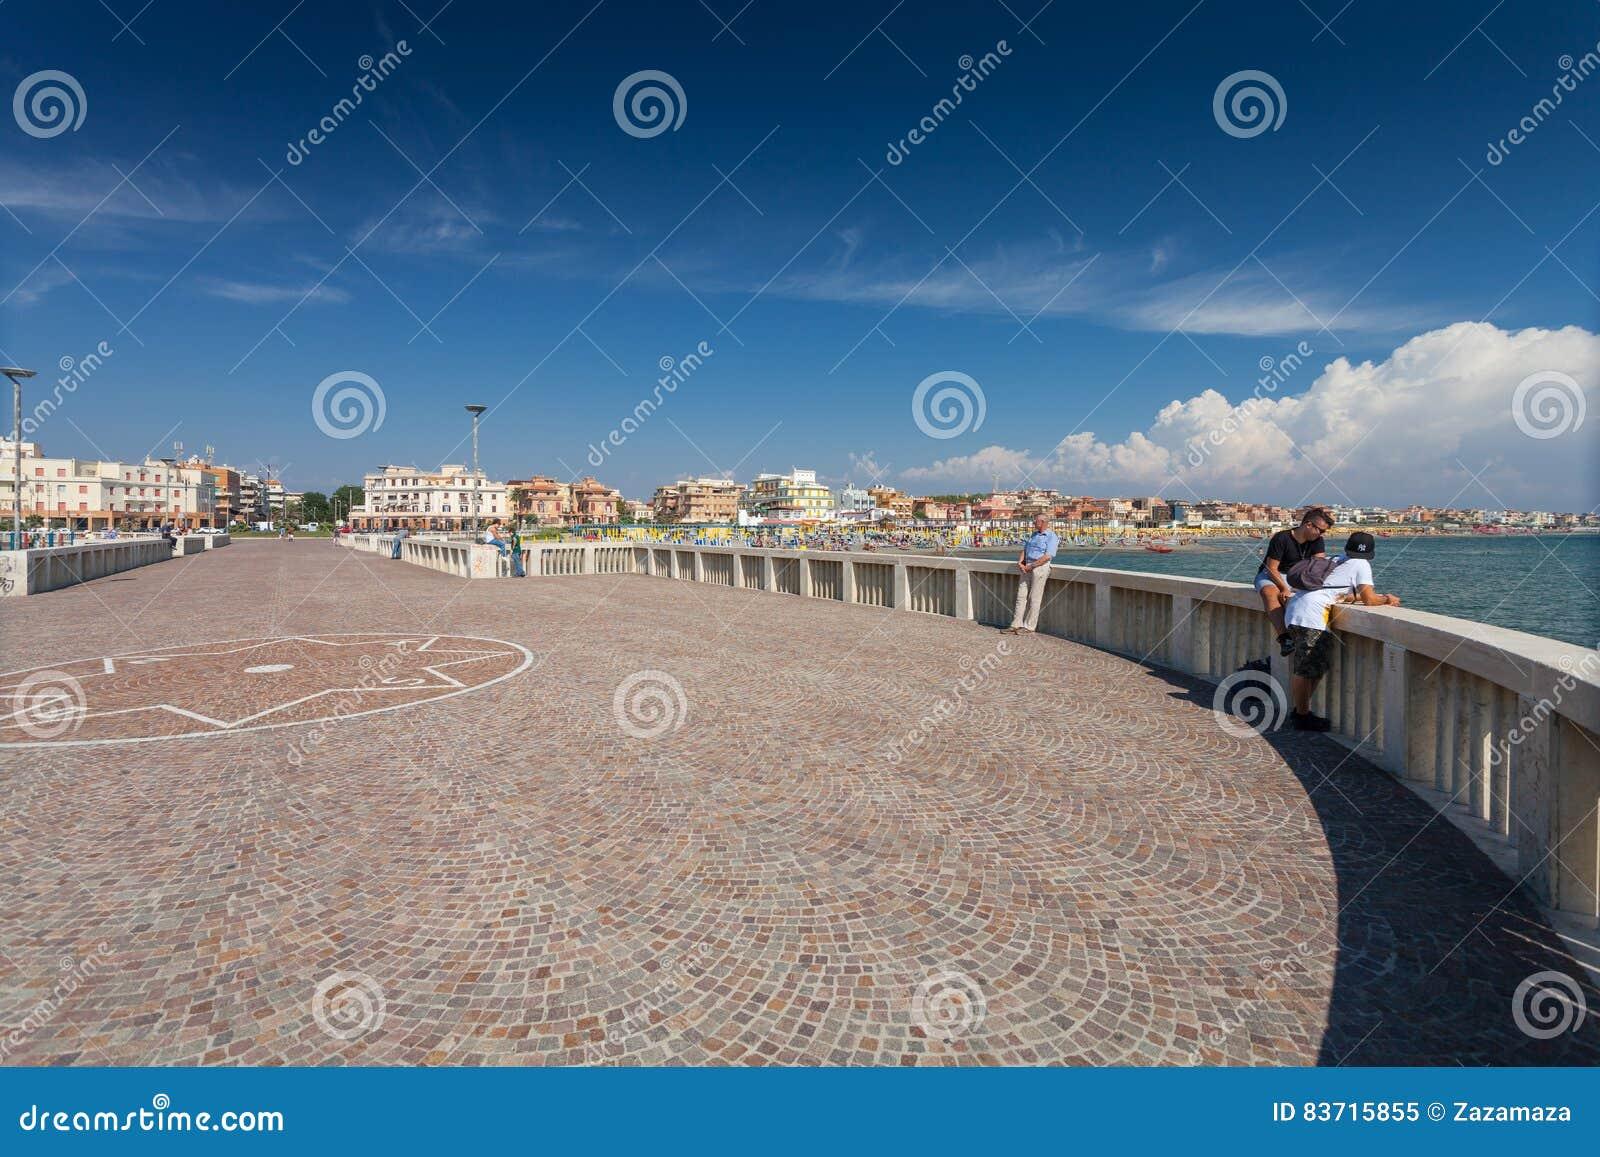 Lido Di Ostia, ITALY - September 14, 2016: Relaxing People On The Pier Pontile Di Ostia Near Beautiful Beach Lido Di Ostia Li Editorial Image